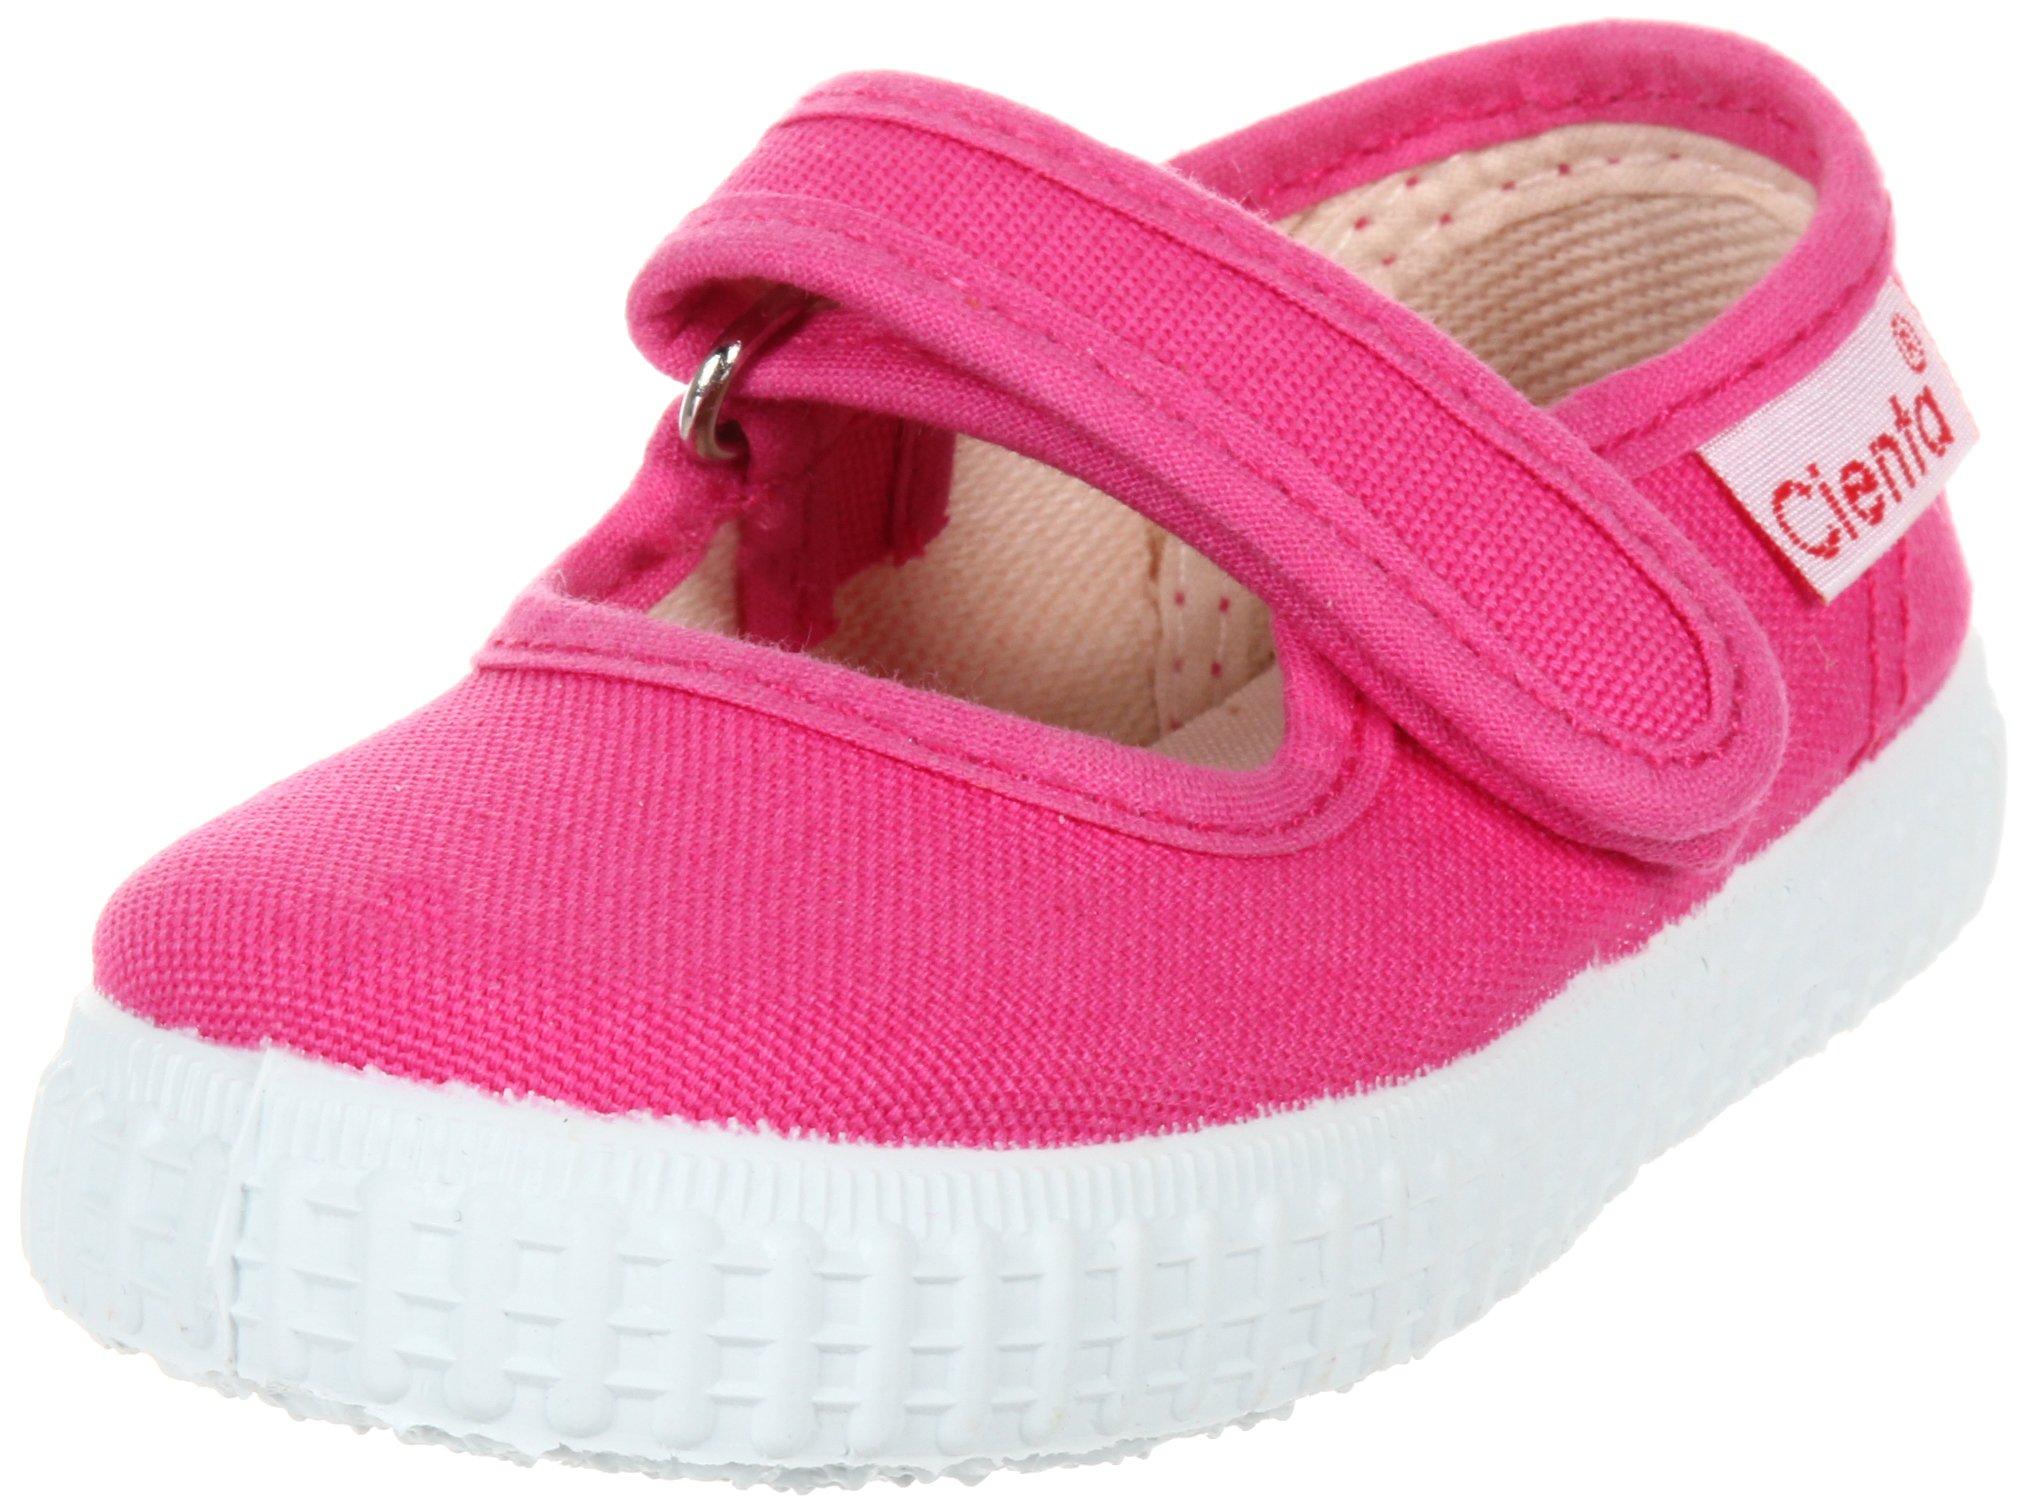 Cienta Girls Mary Jane Shoe, Fuchsia, 18 M EU / 2.5 M US Infant